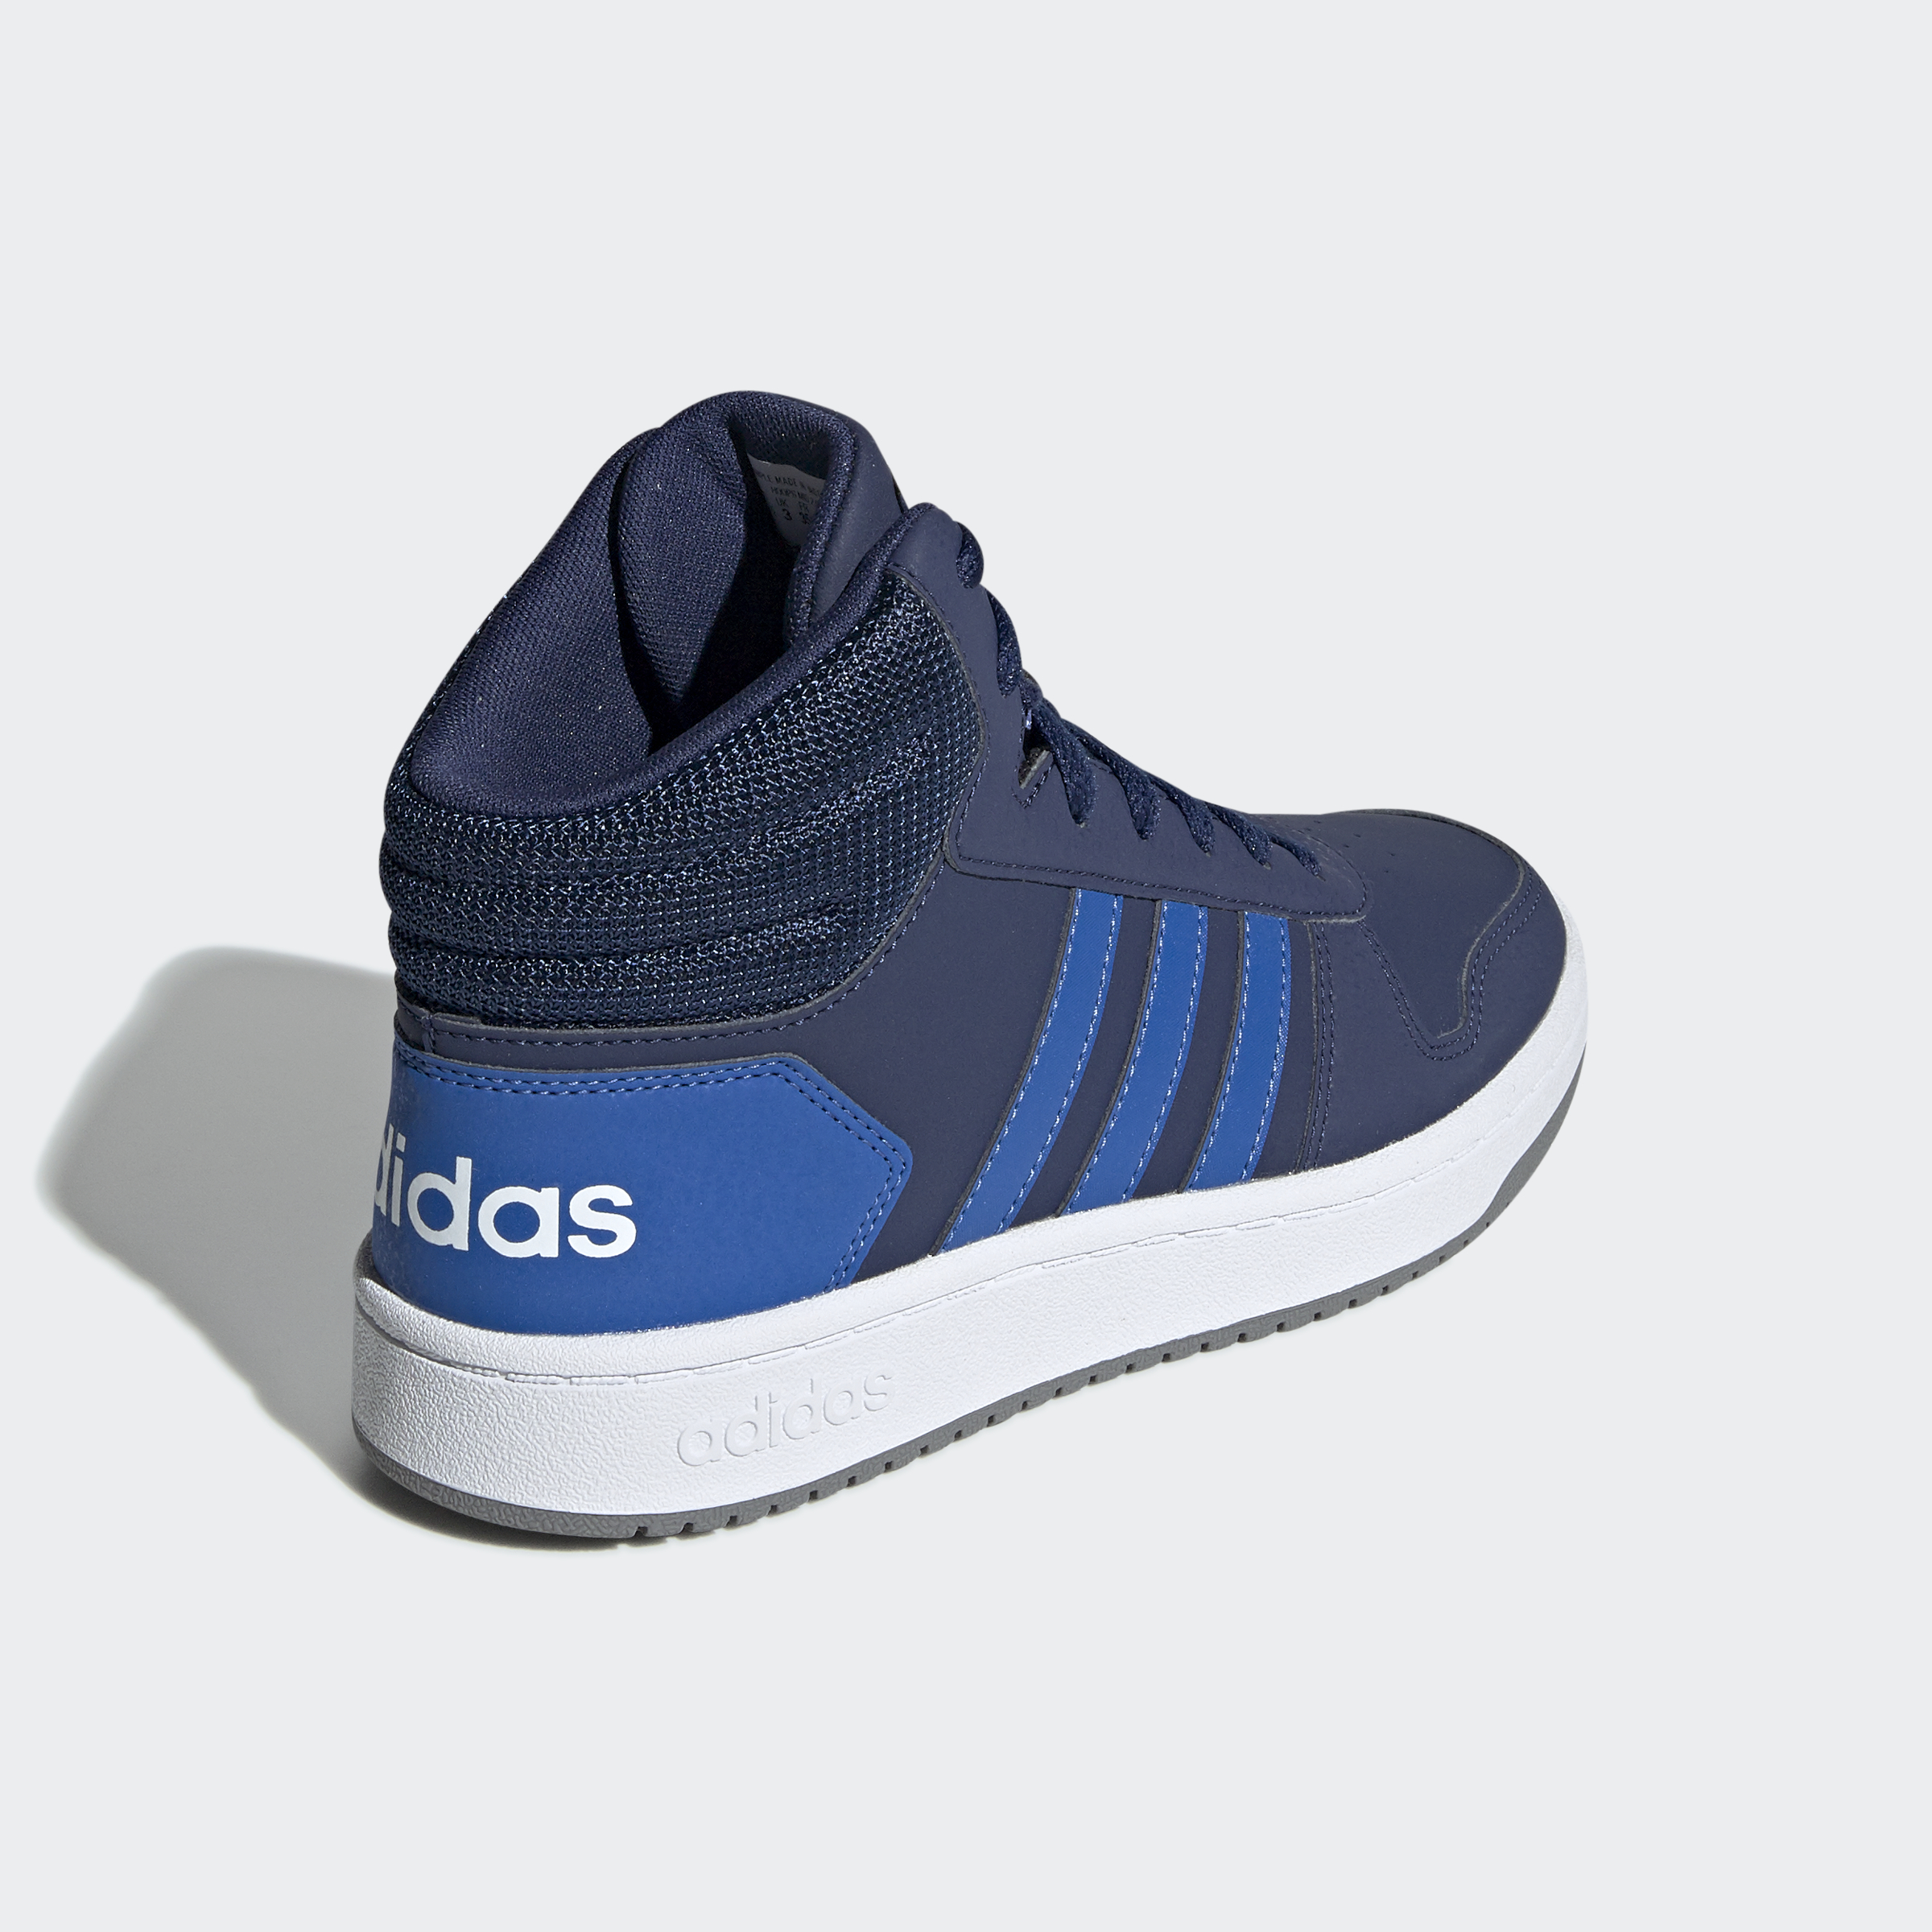 adidas-Hoops-2-0-Mid-Shoes-Kids-039-High-Tops thumbnail 11